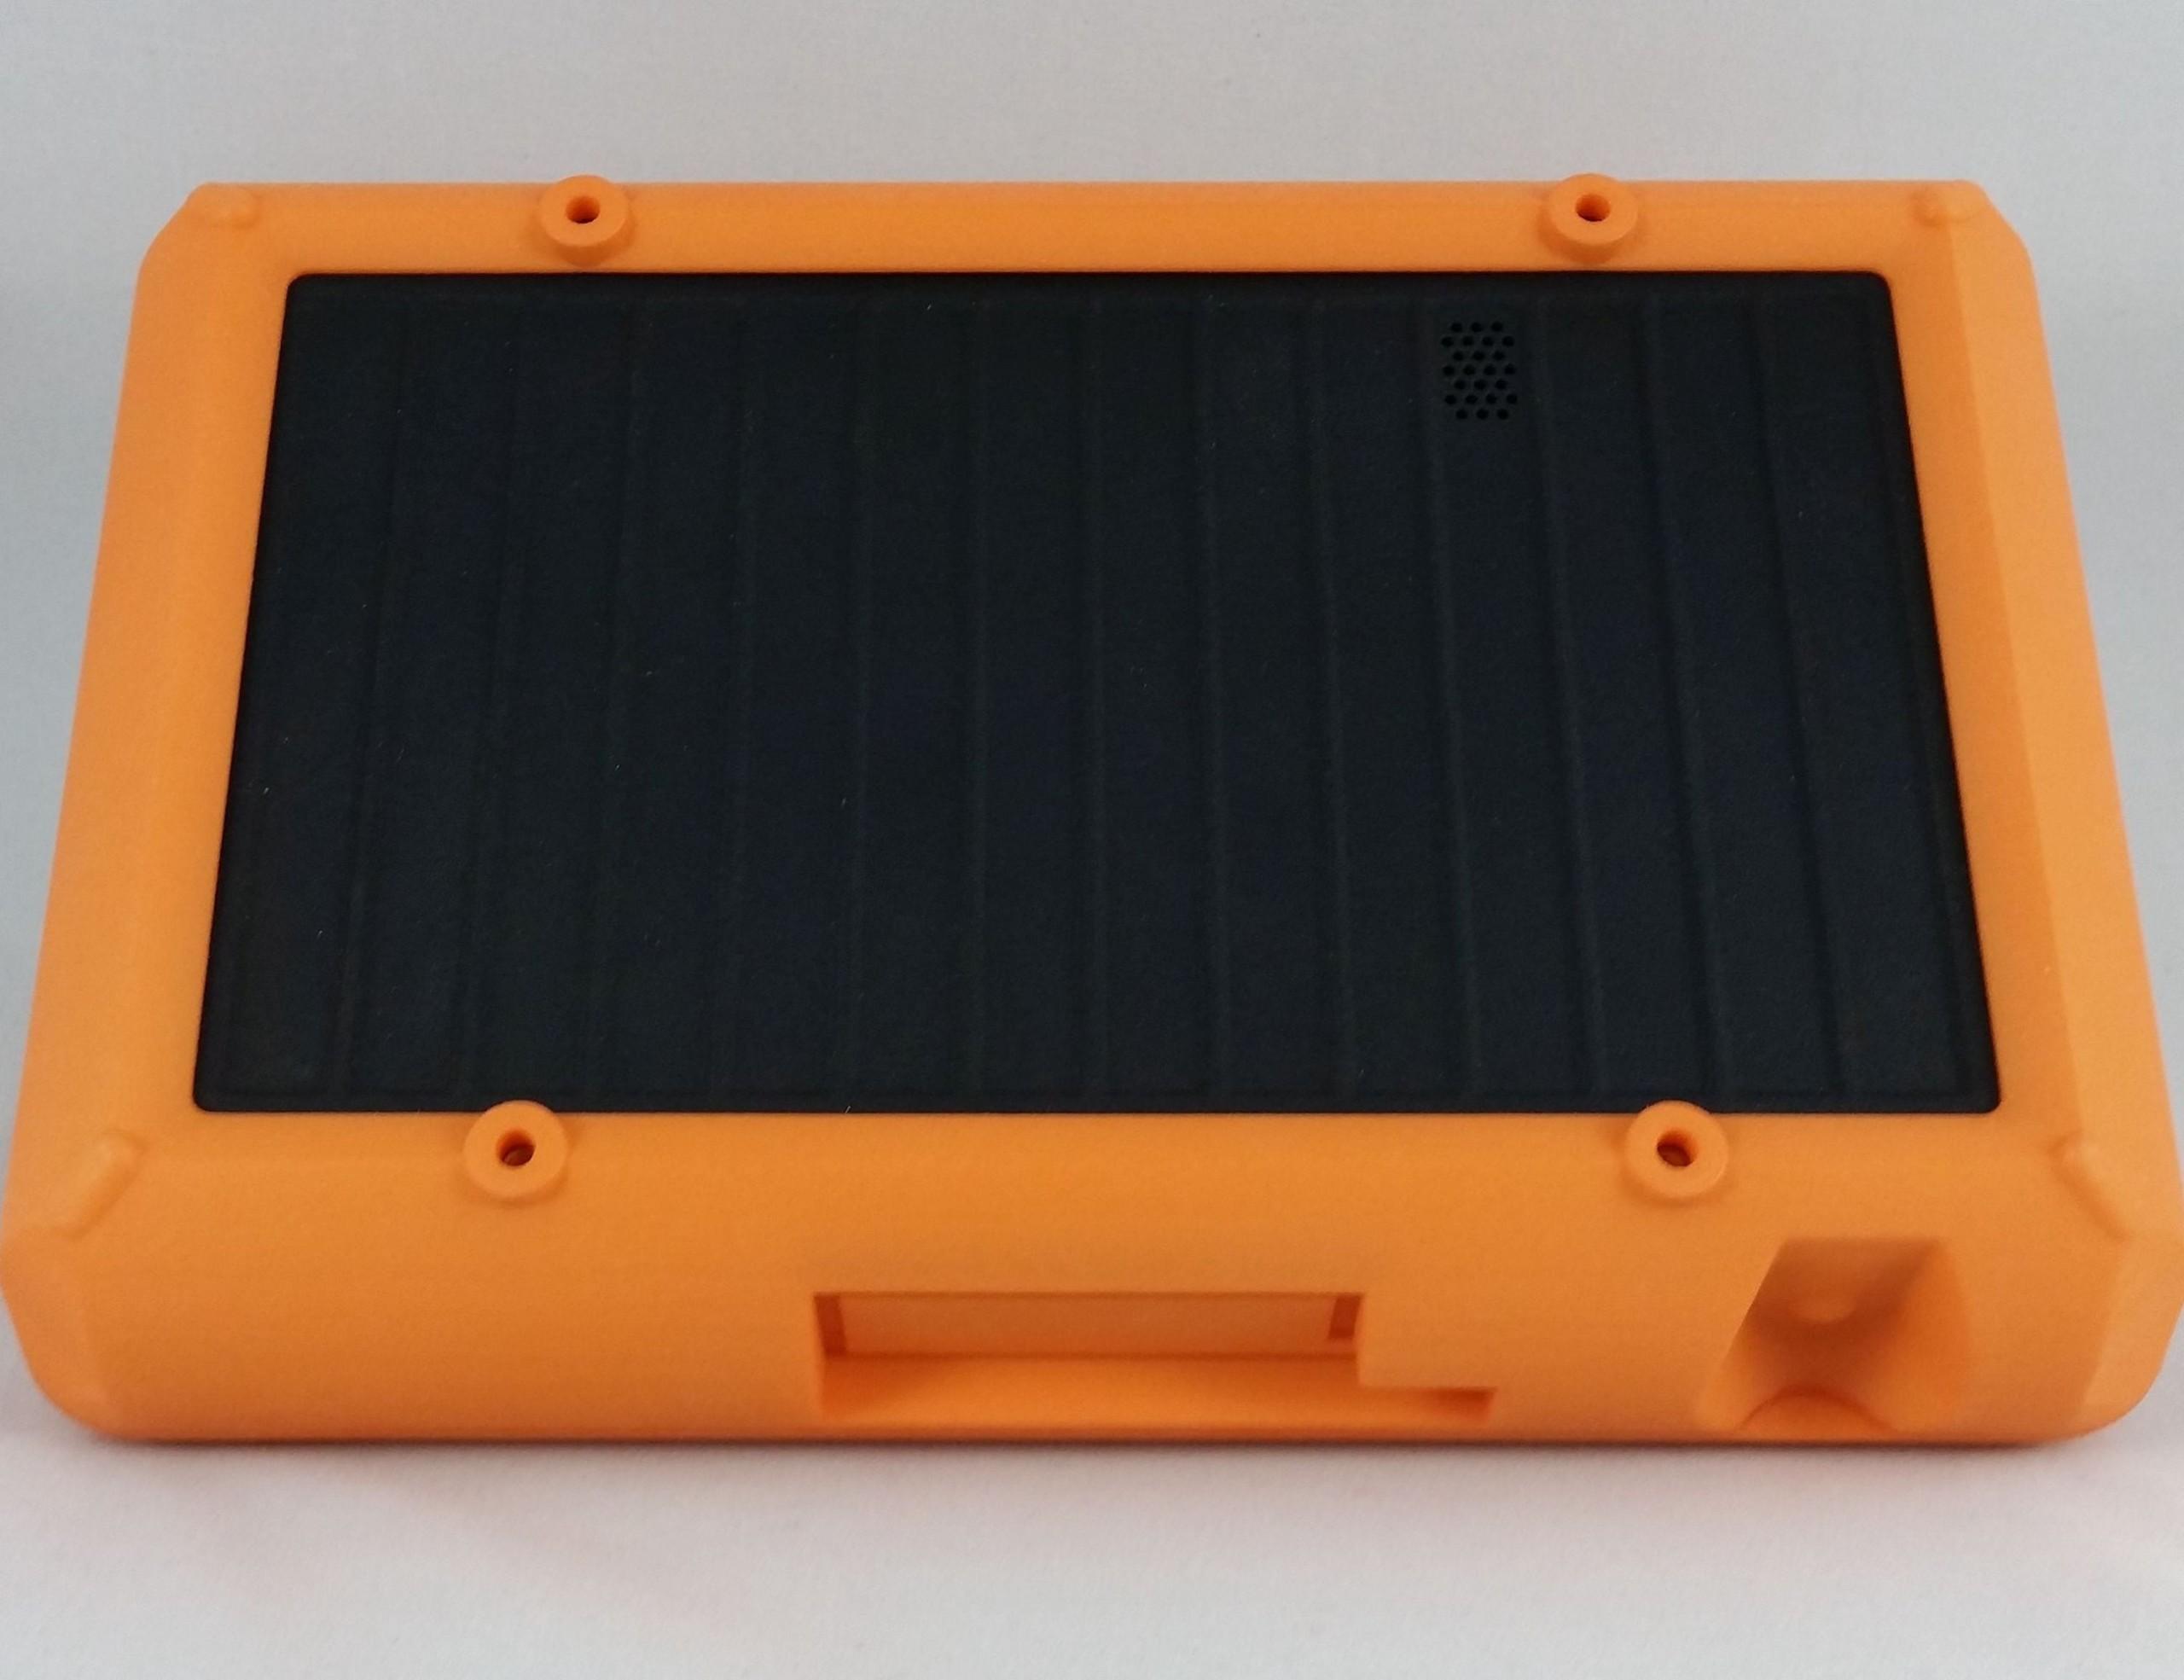 HackerTab Pro Industrial Raspberry Pi Tablet